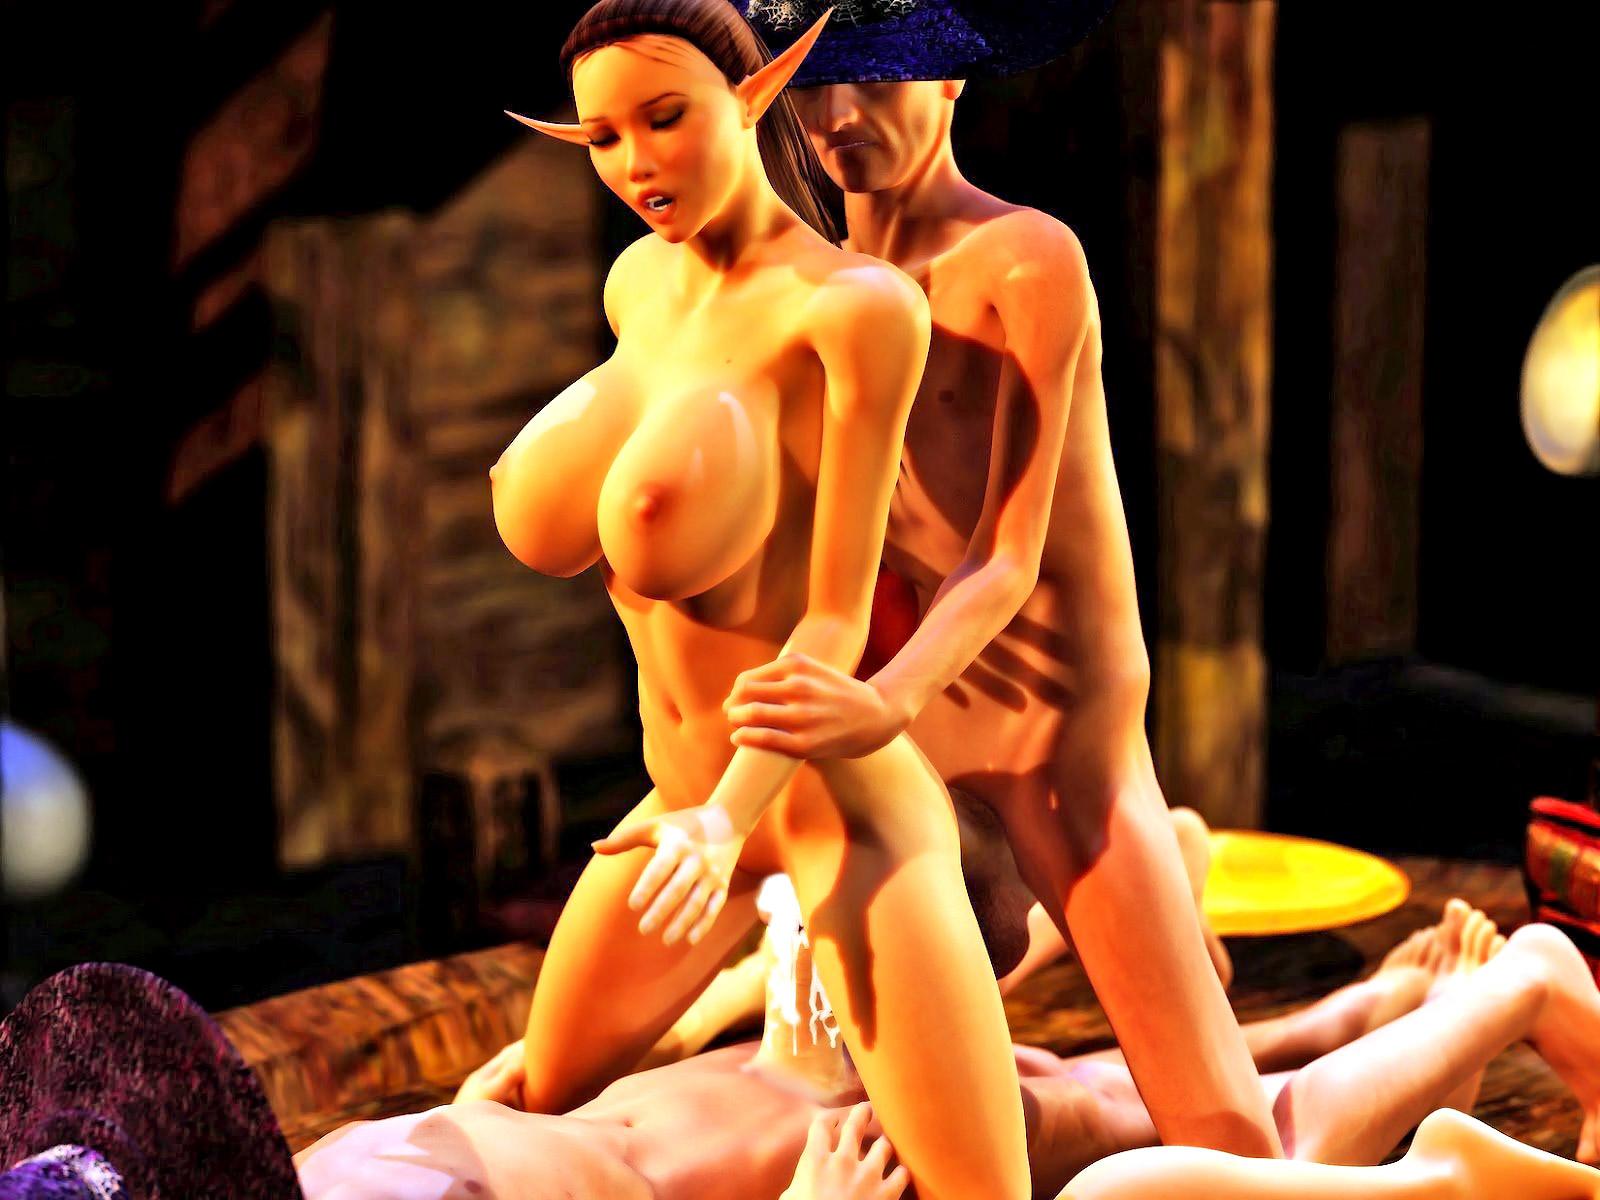 Elf slut pics hentai tube